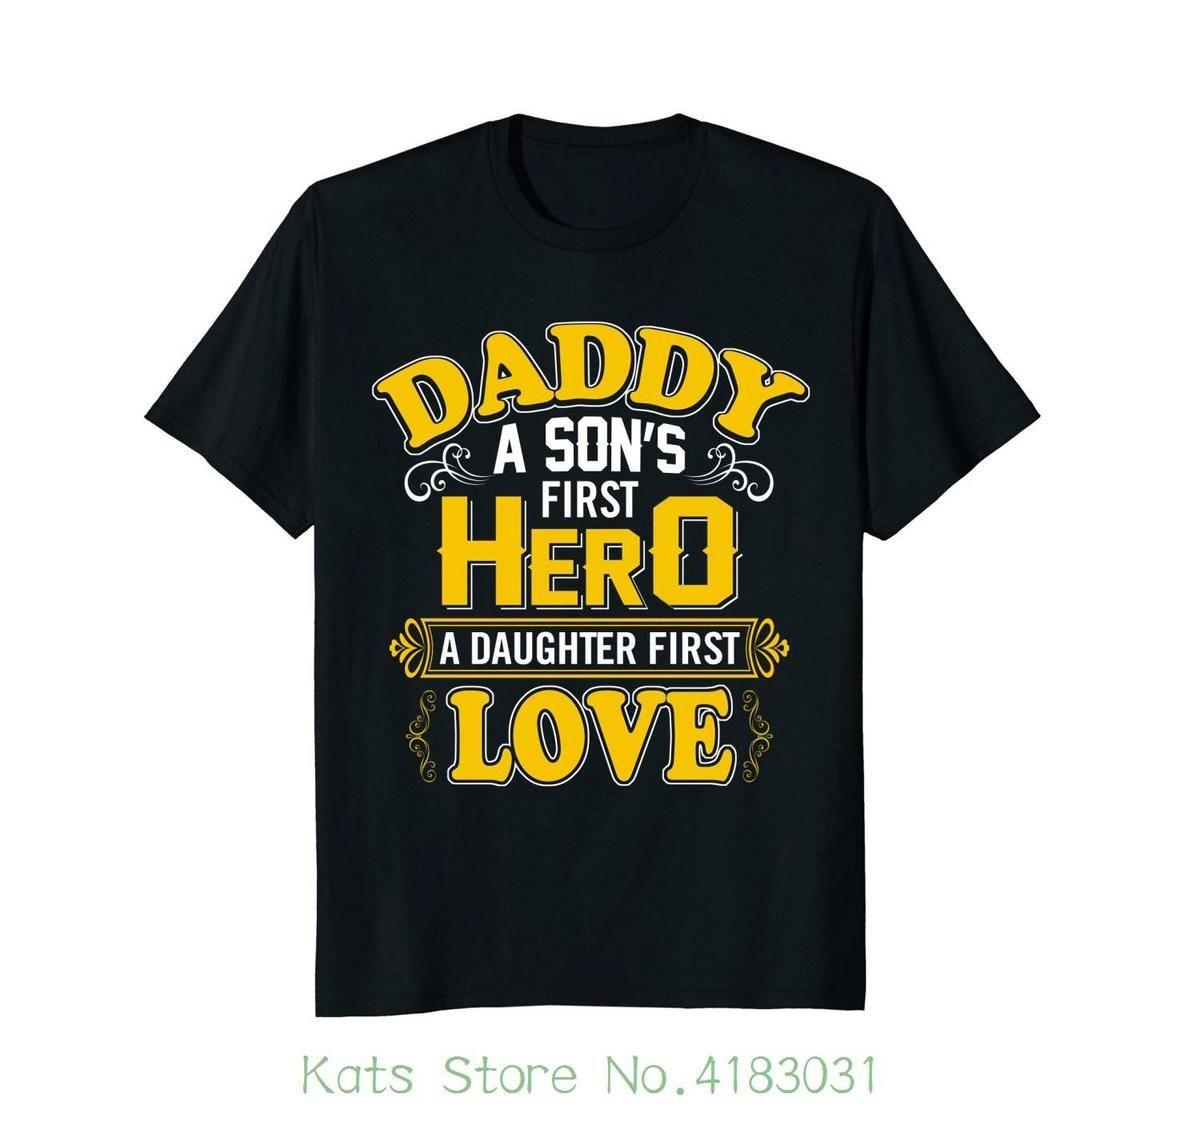 8c0b107d Daddy A Son's First Hero A Daughter's First Love T shirt Custom Made Good  Quality T Shirt